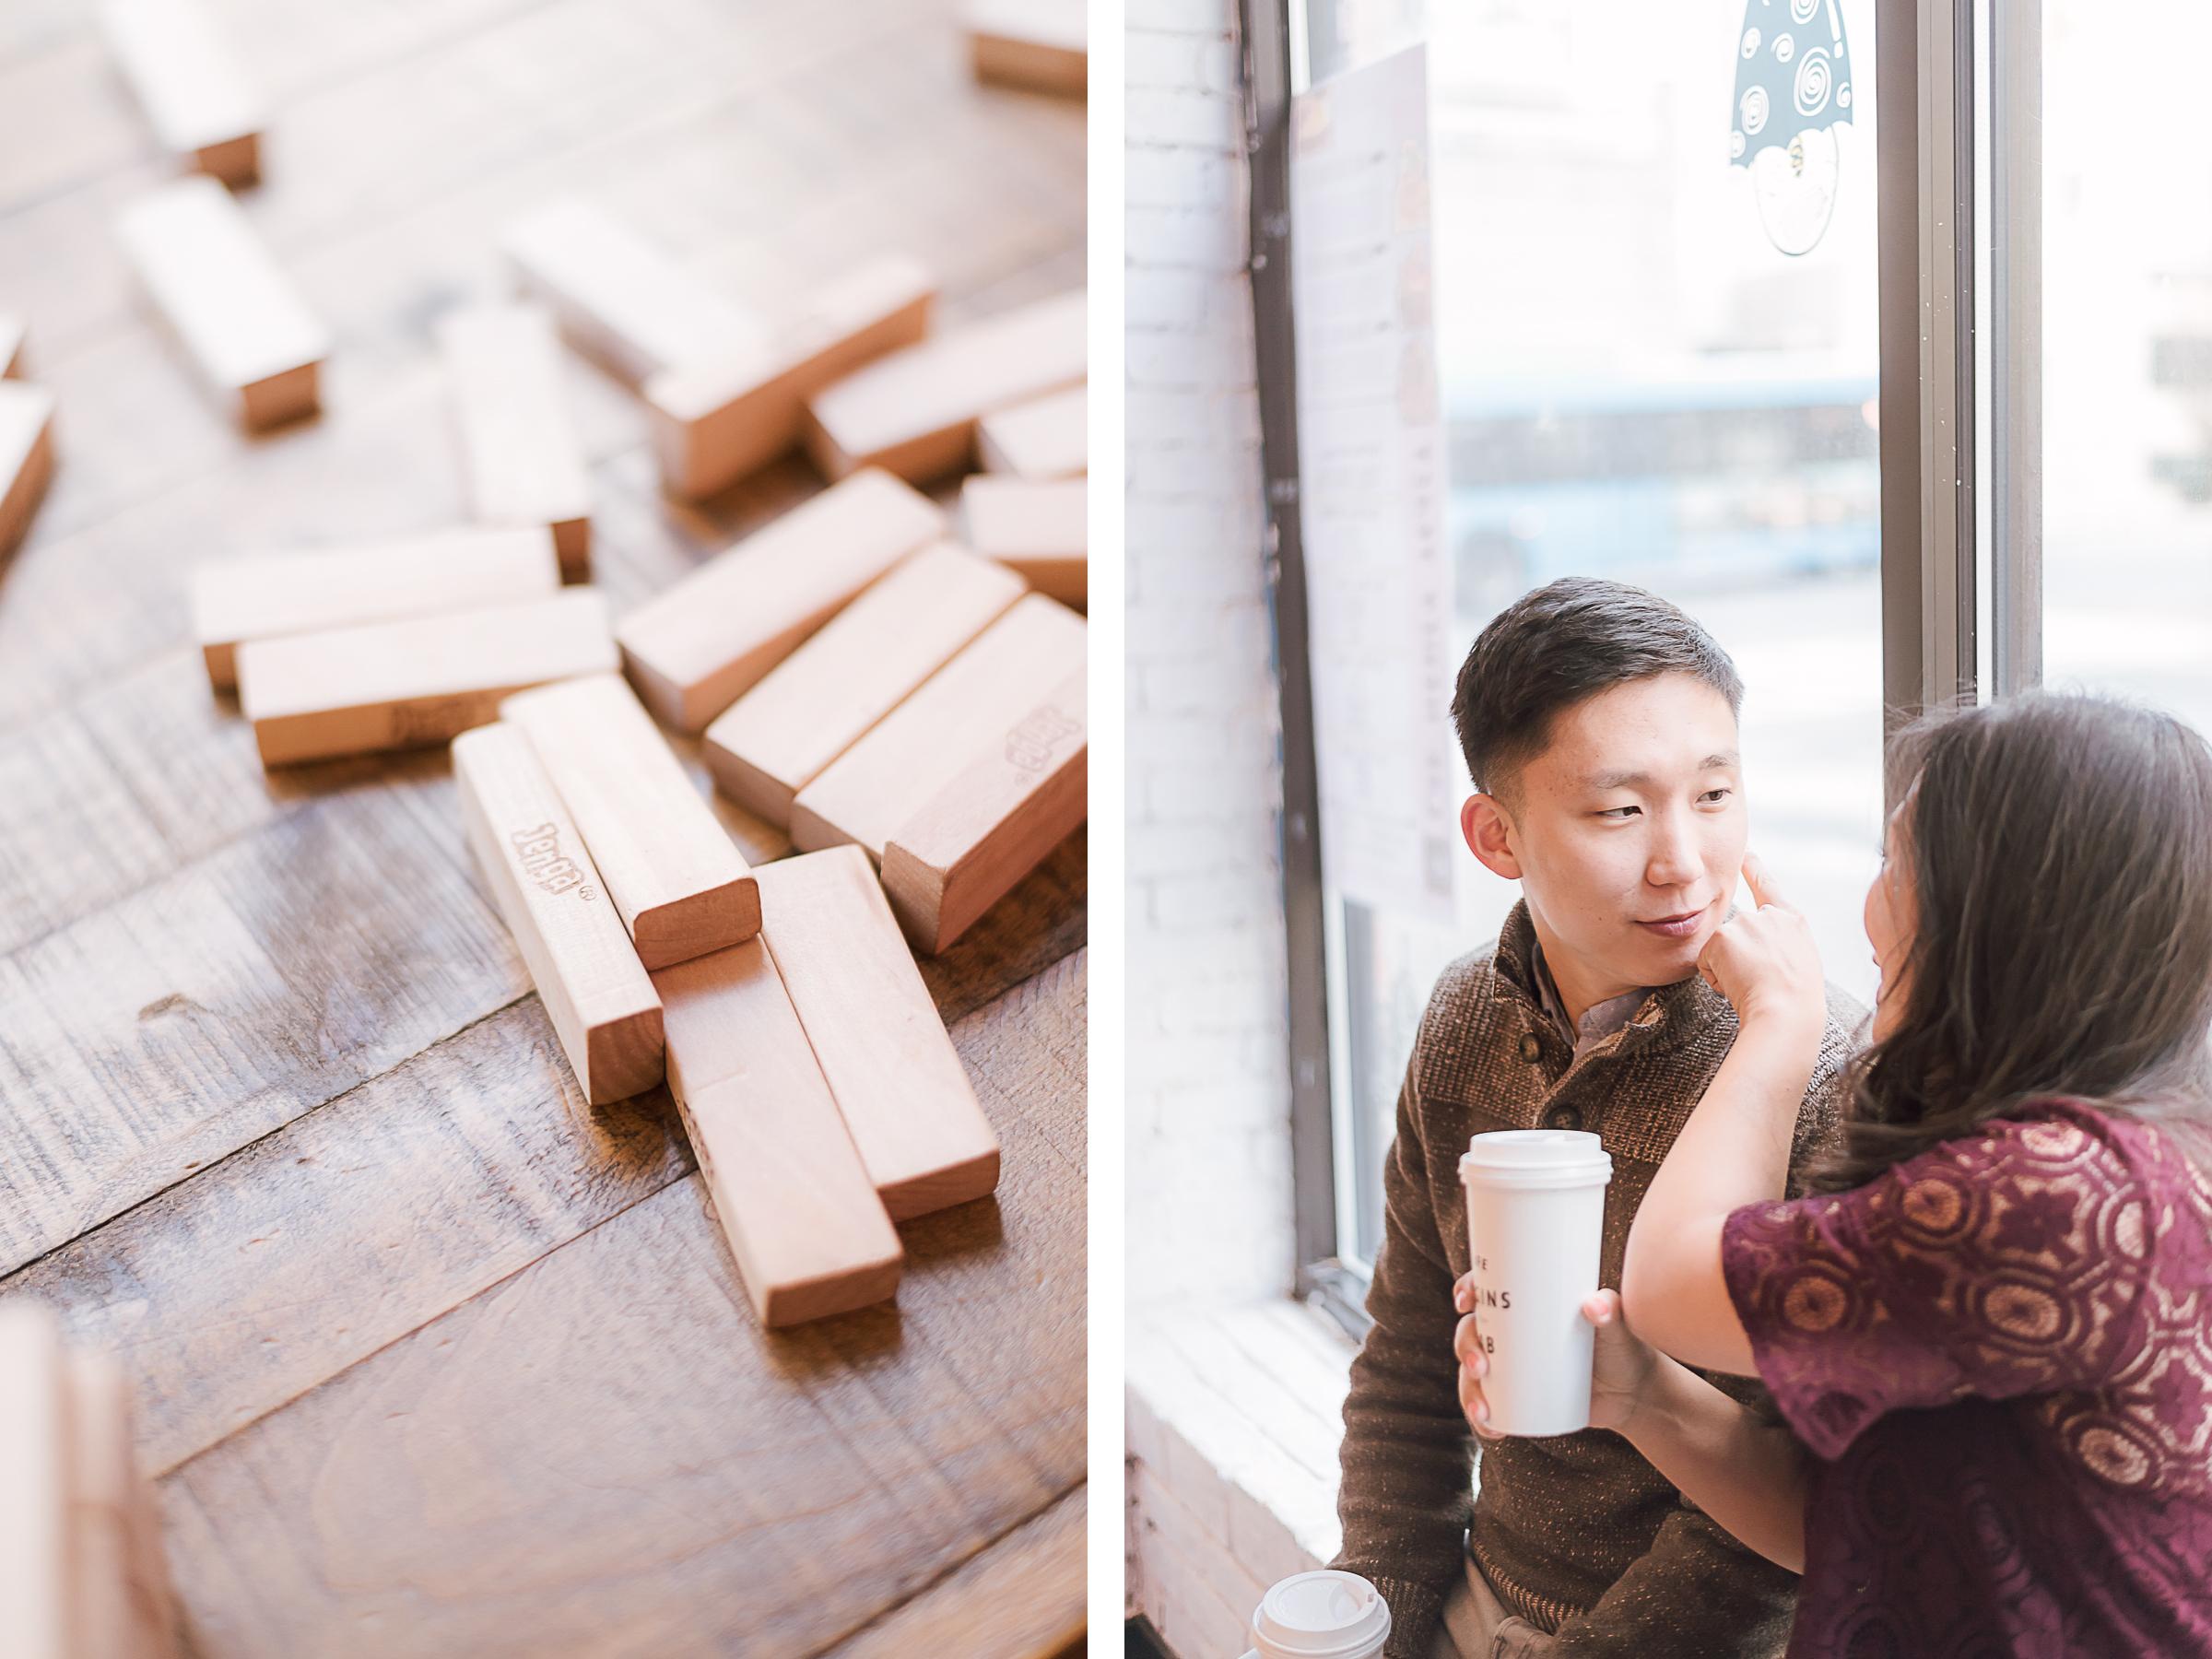 MD-Engagement-Rockville-Lab-Cafe-Bubble-Tea-Jenga.jpg